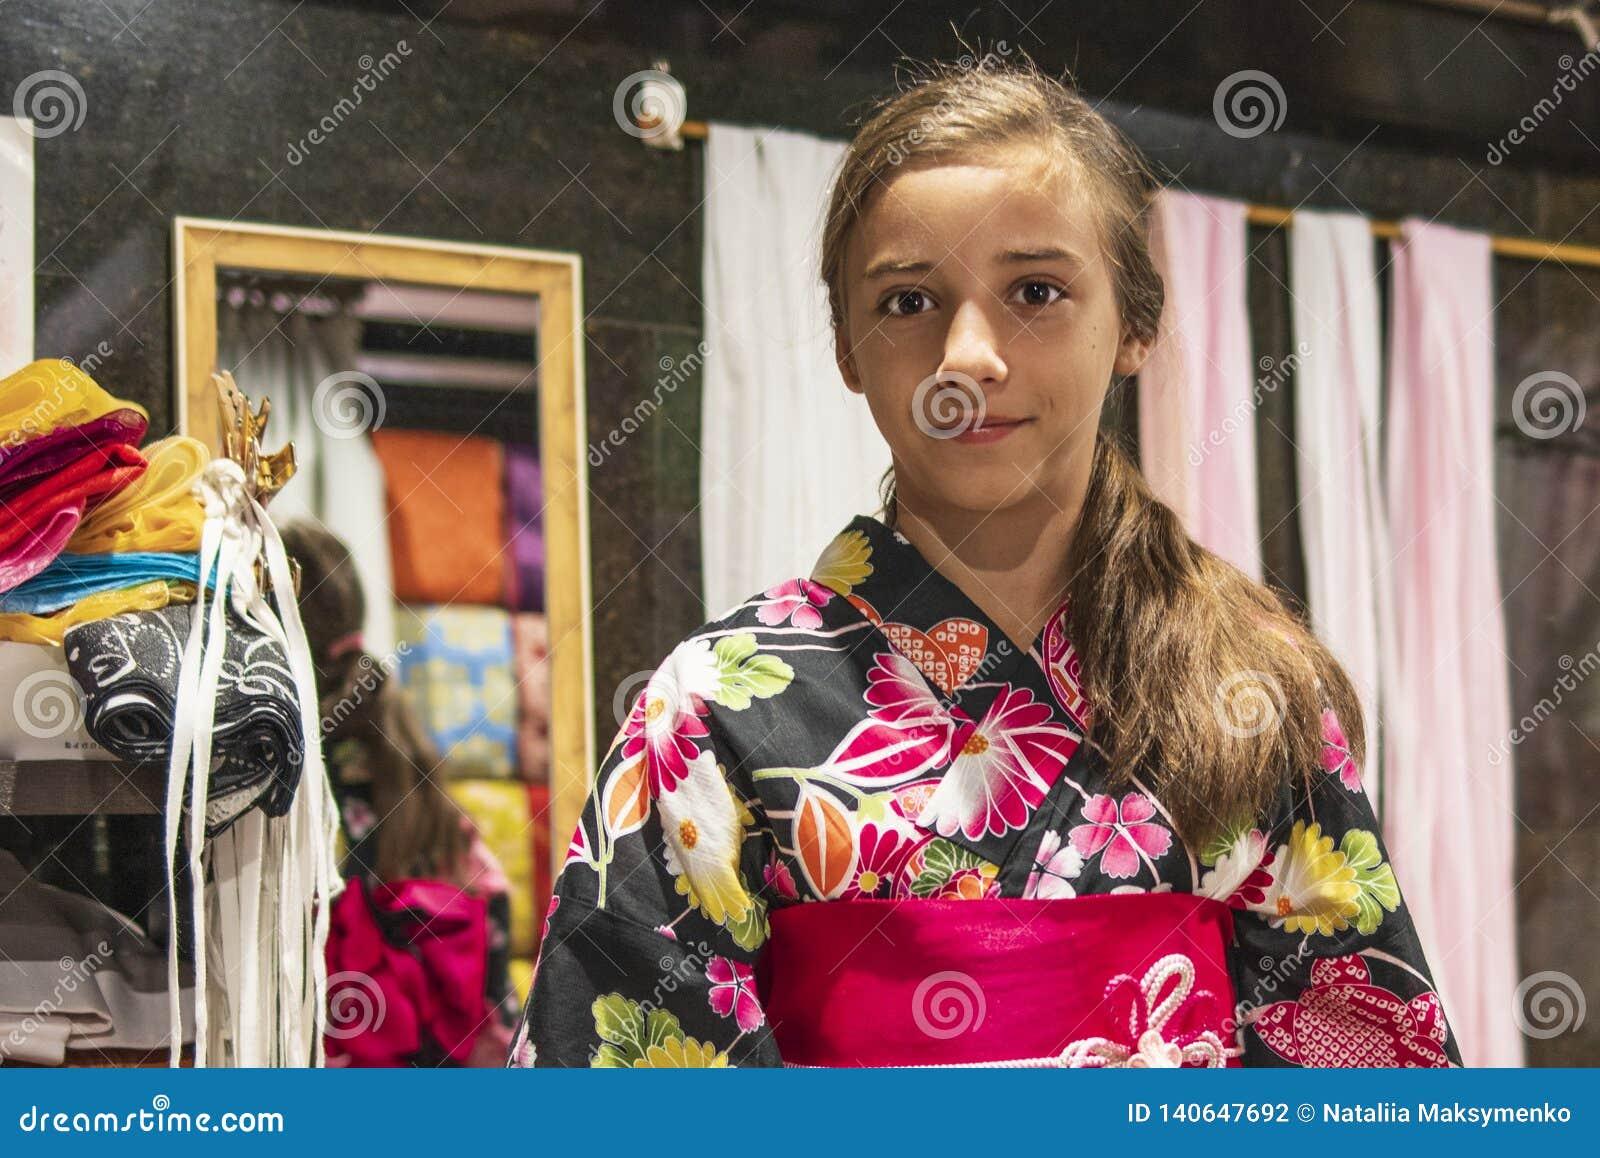 609d2494aacd8 A Pretty Girl In A Kimono. Kimono Is The Traditional Dress Worn ...